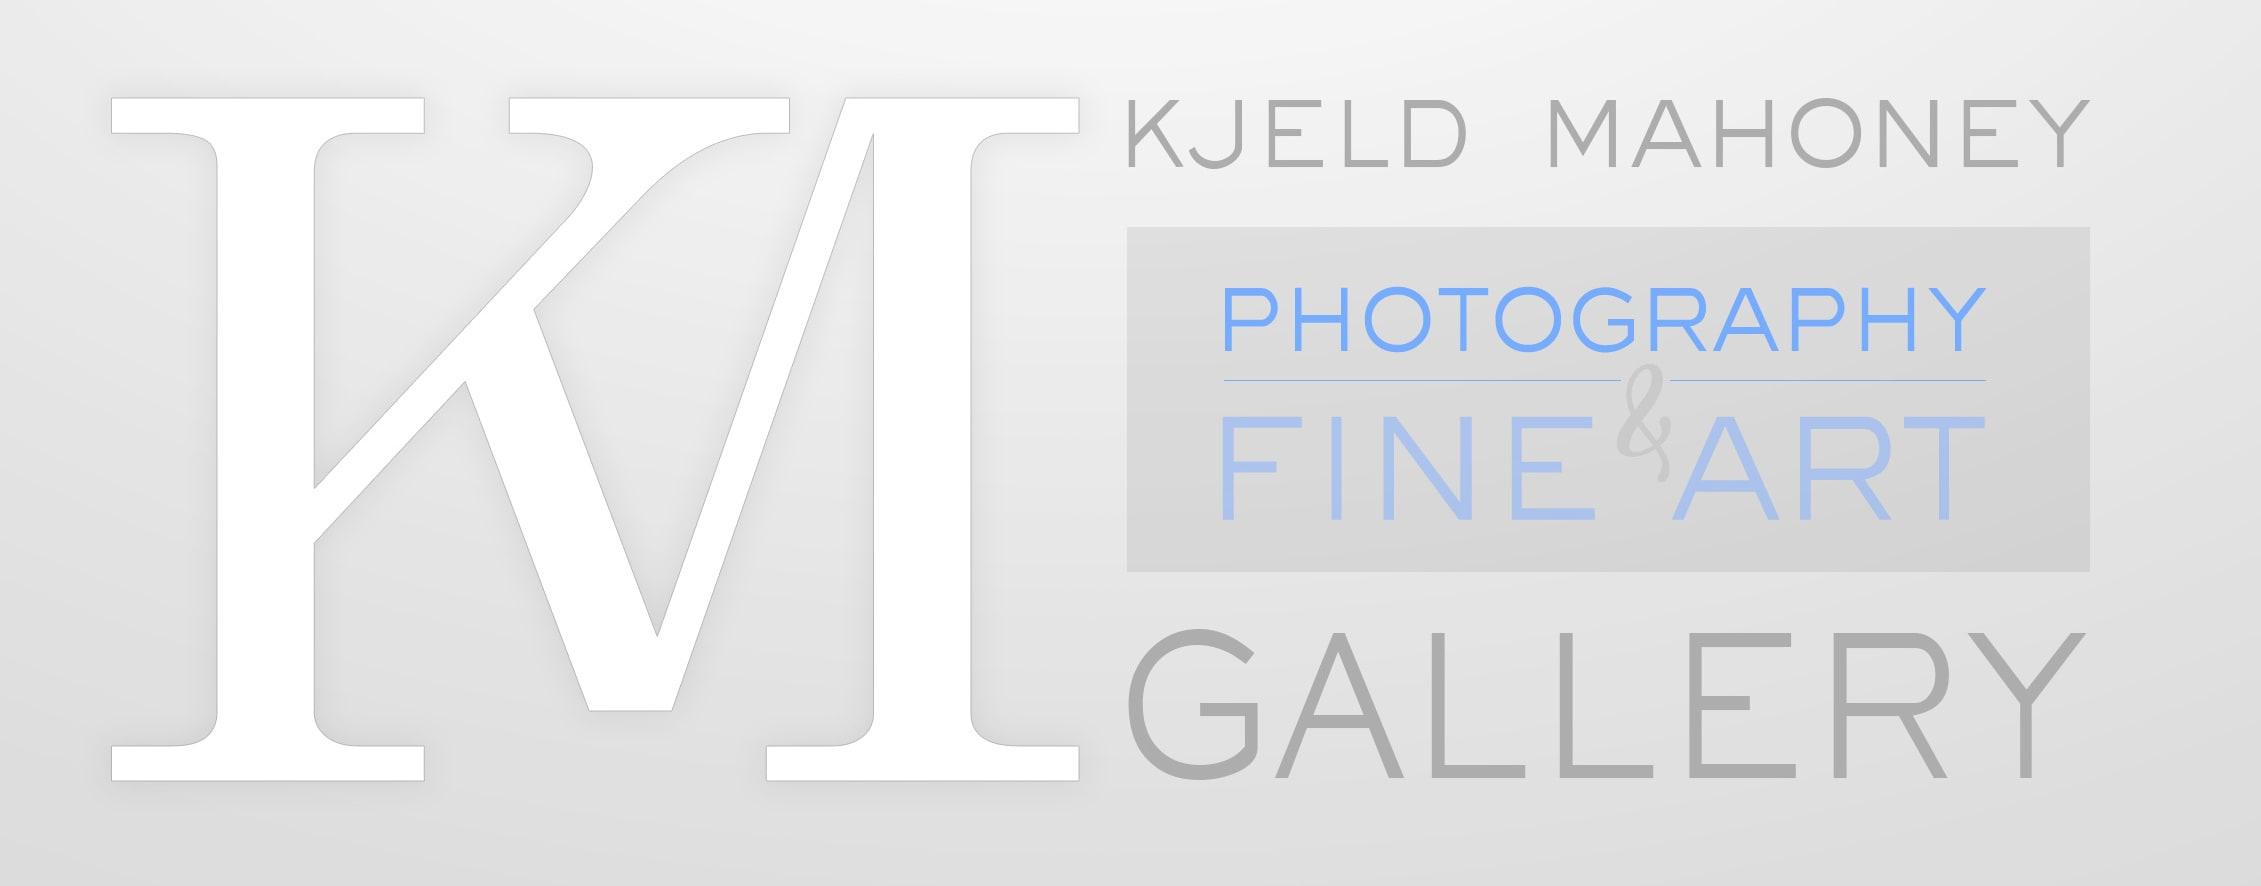 kjeld mahoney photography/fine art gallery